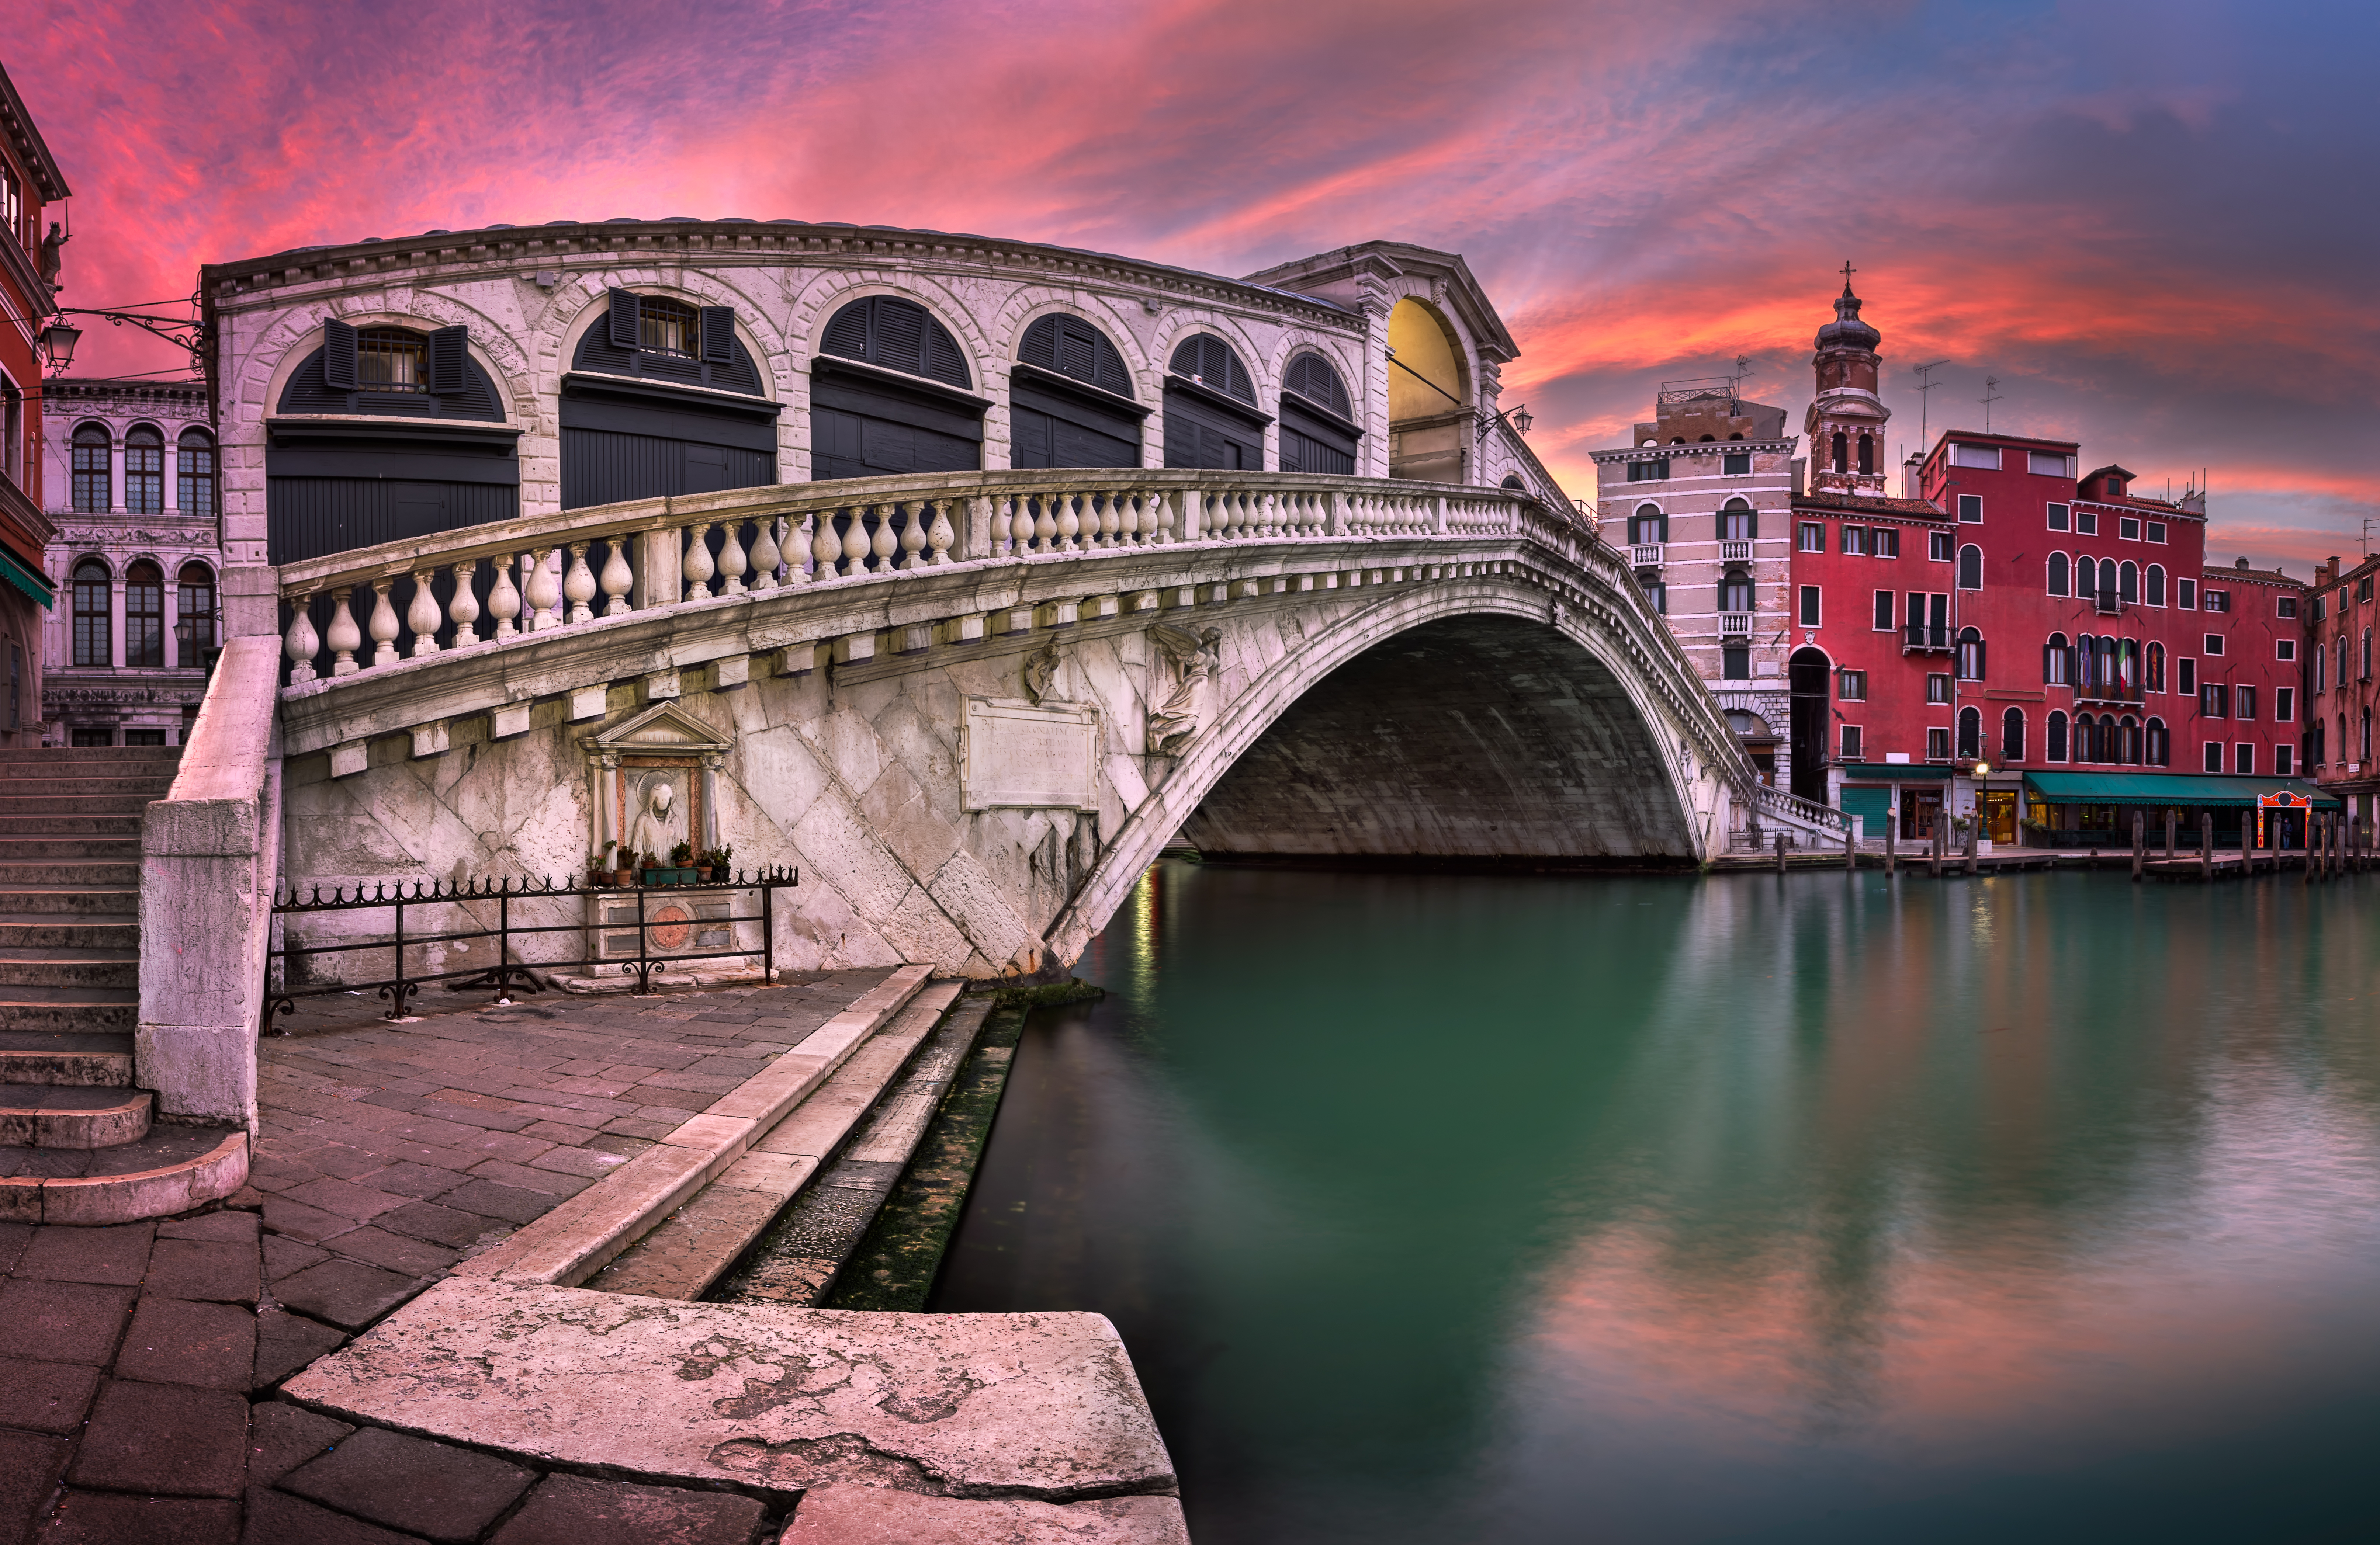 Bridge Italy Rialto Bridge Venice 6453x4190